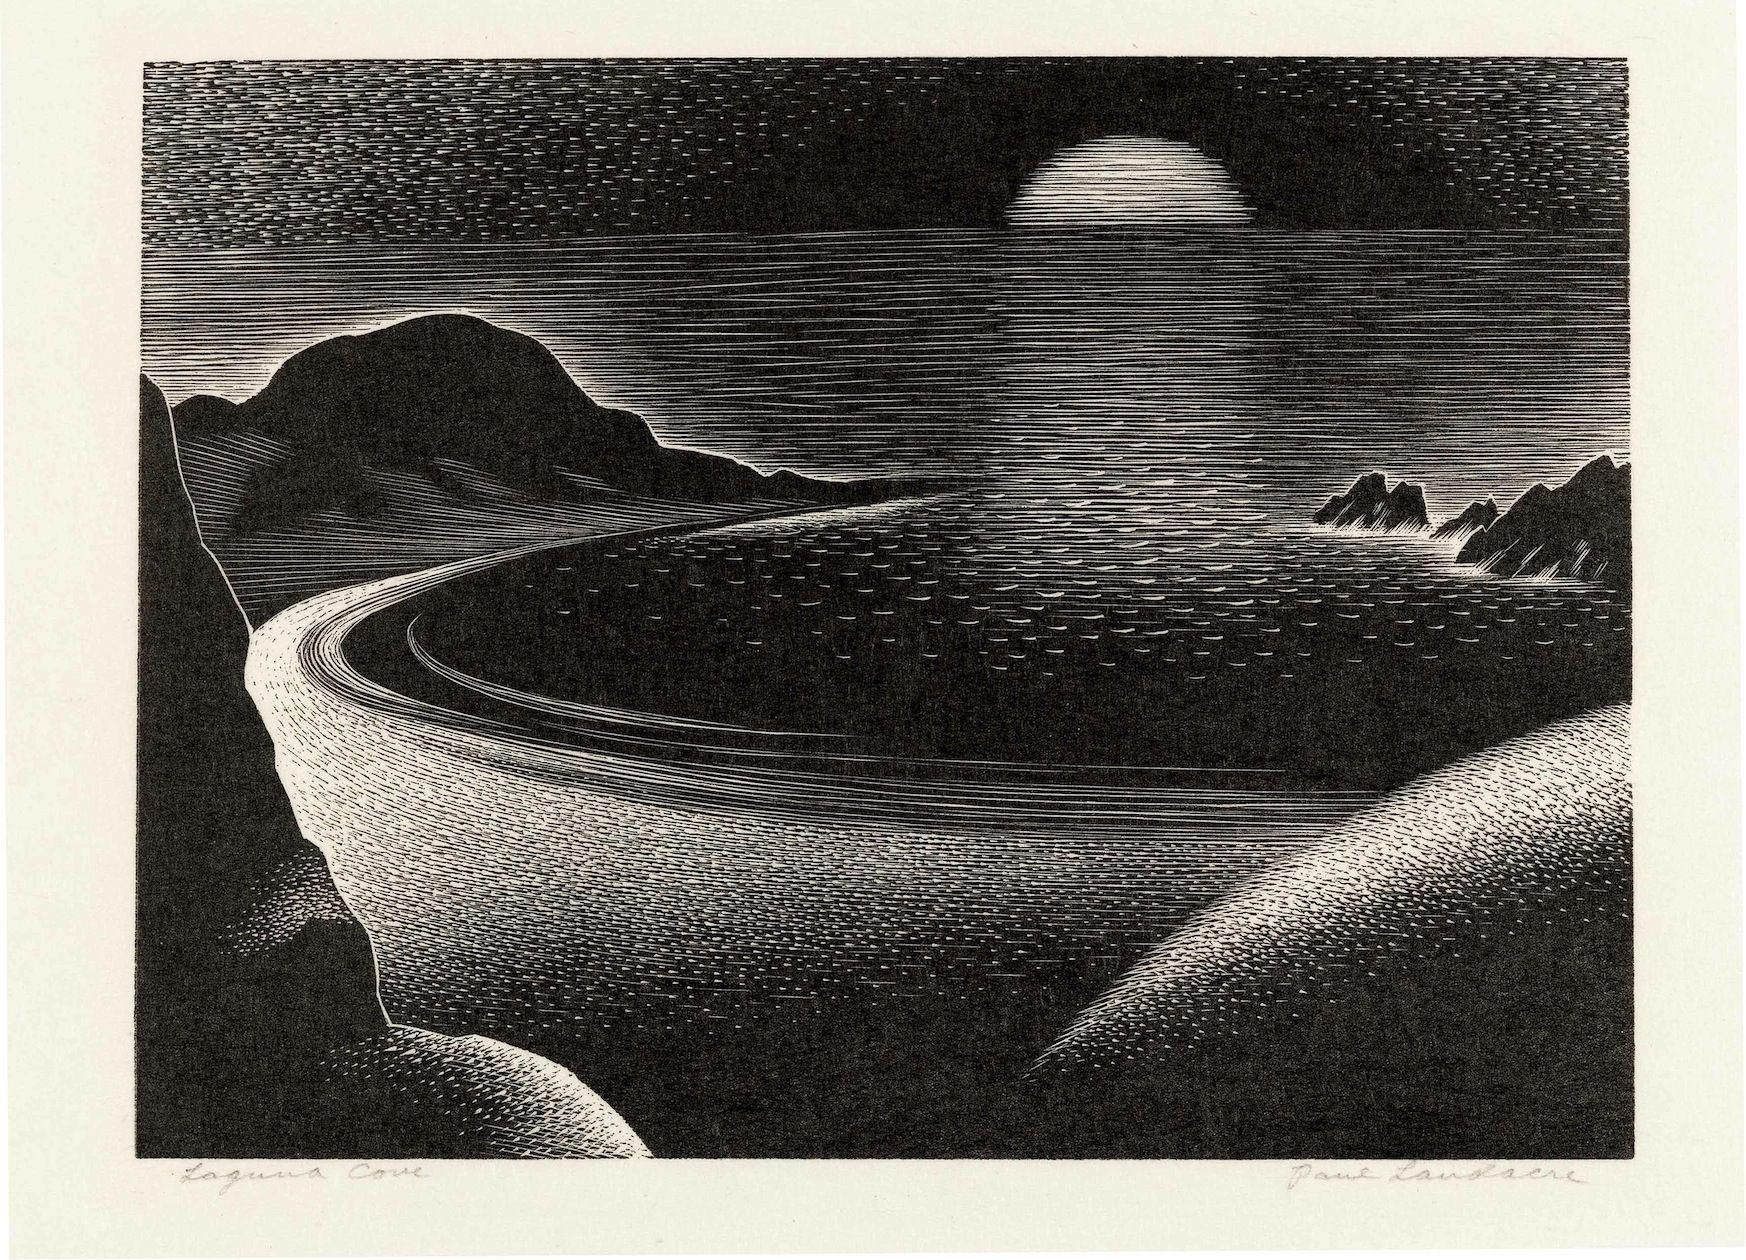 Paul Landacre, Laguna Cove, 1935, Wood engraving, 18,73 x 27,31 cm, National Gallery of Art, Washington